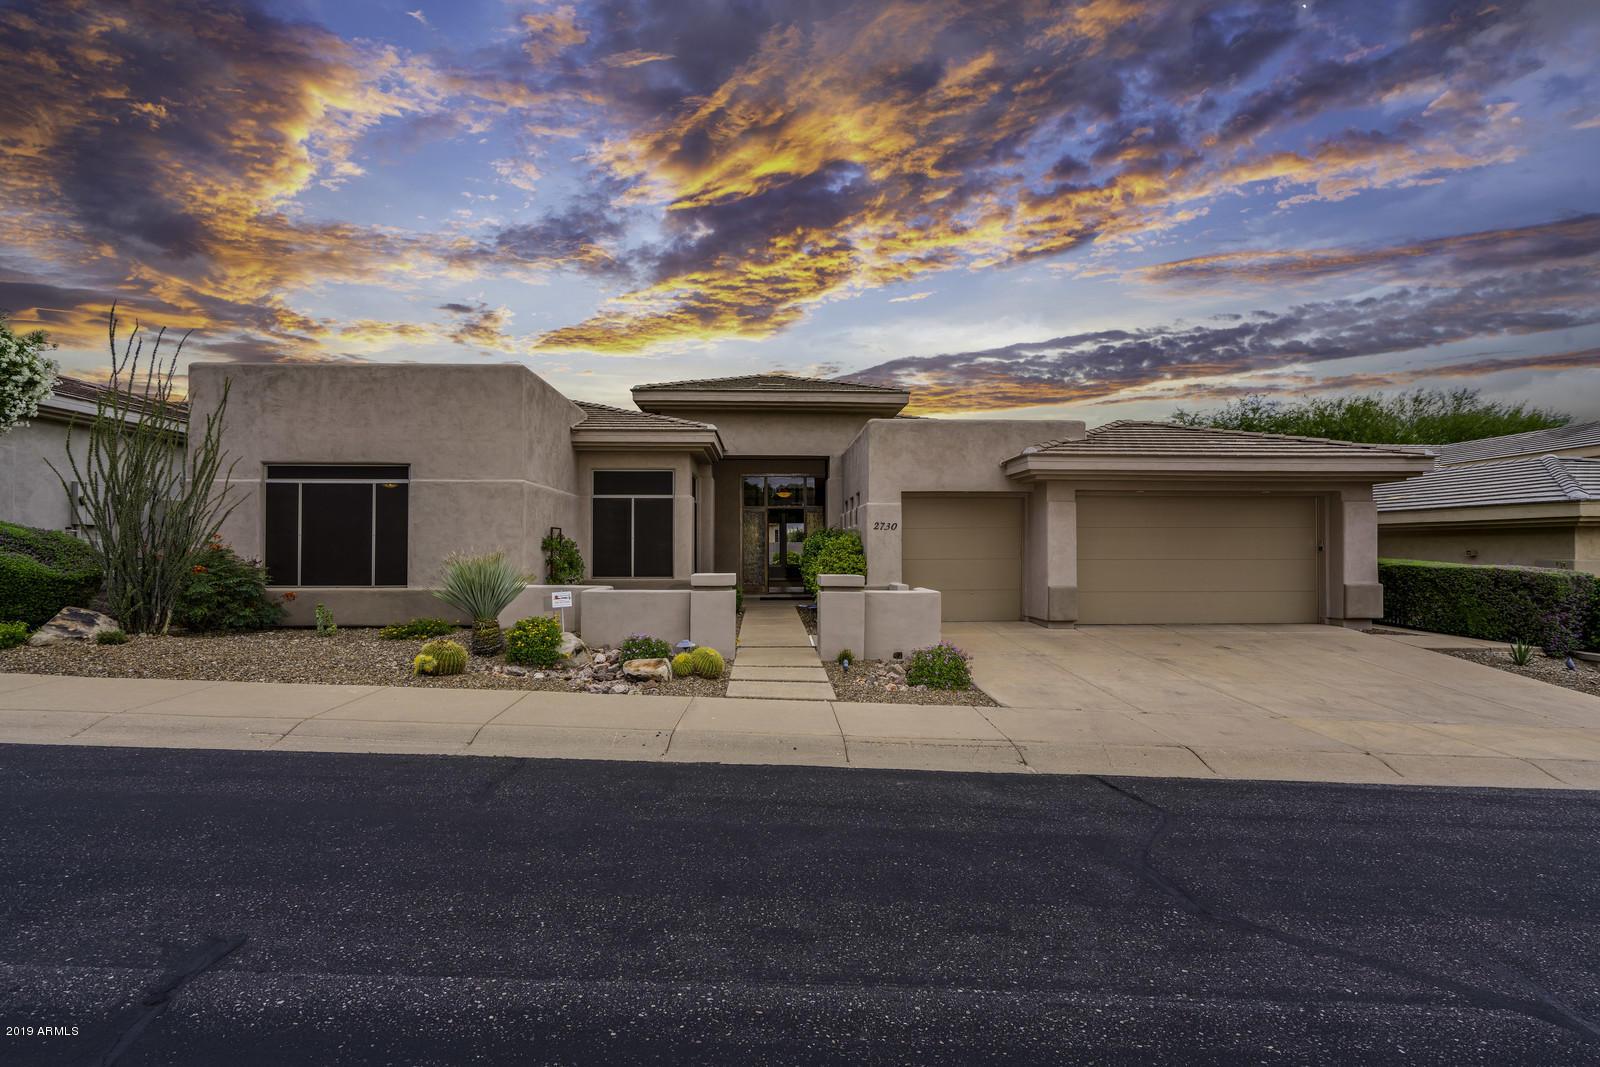 2730 E EVANS Drive, Phoenix AZ 85032